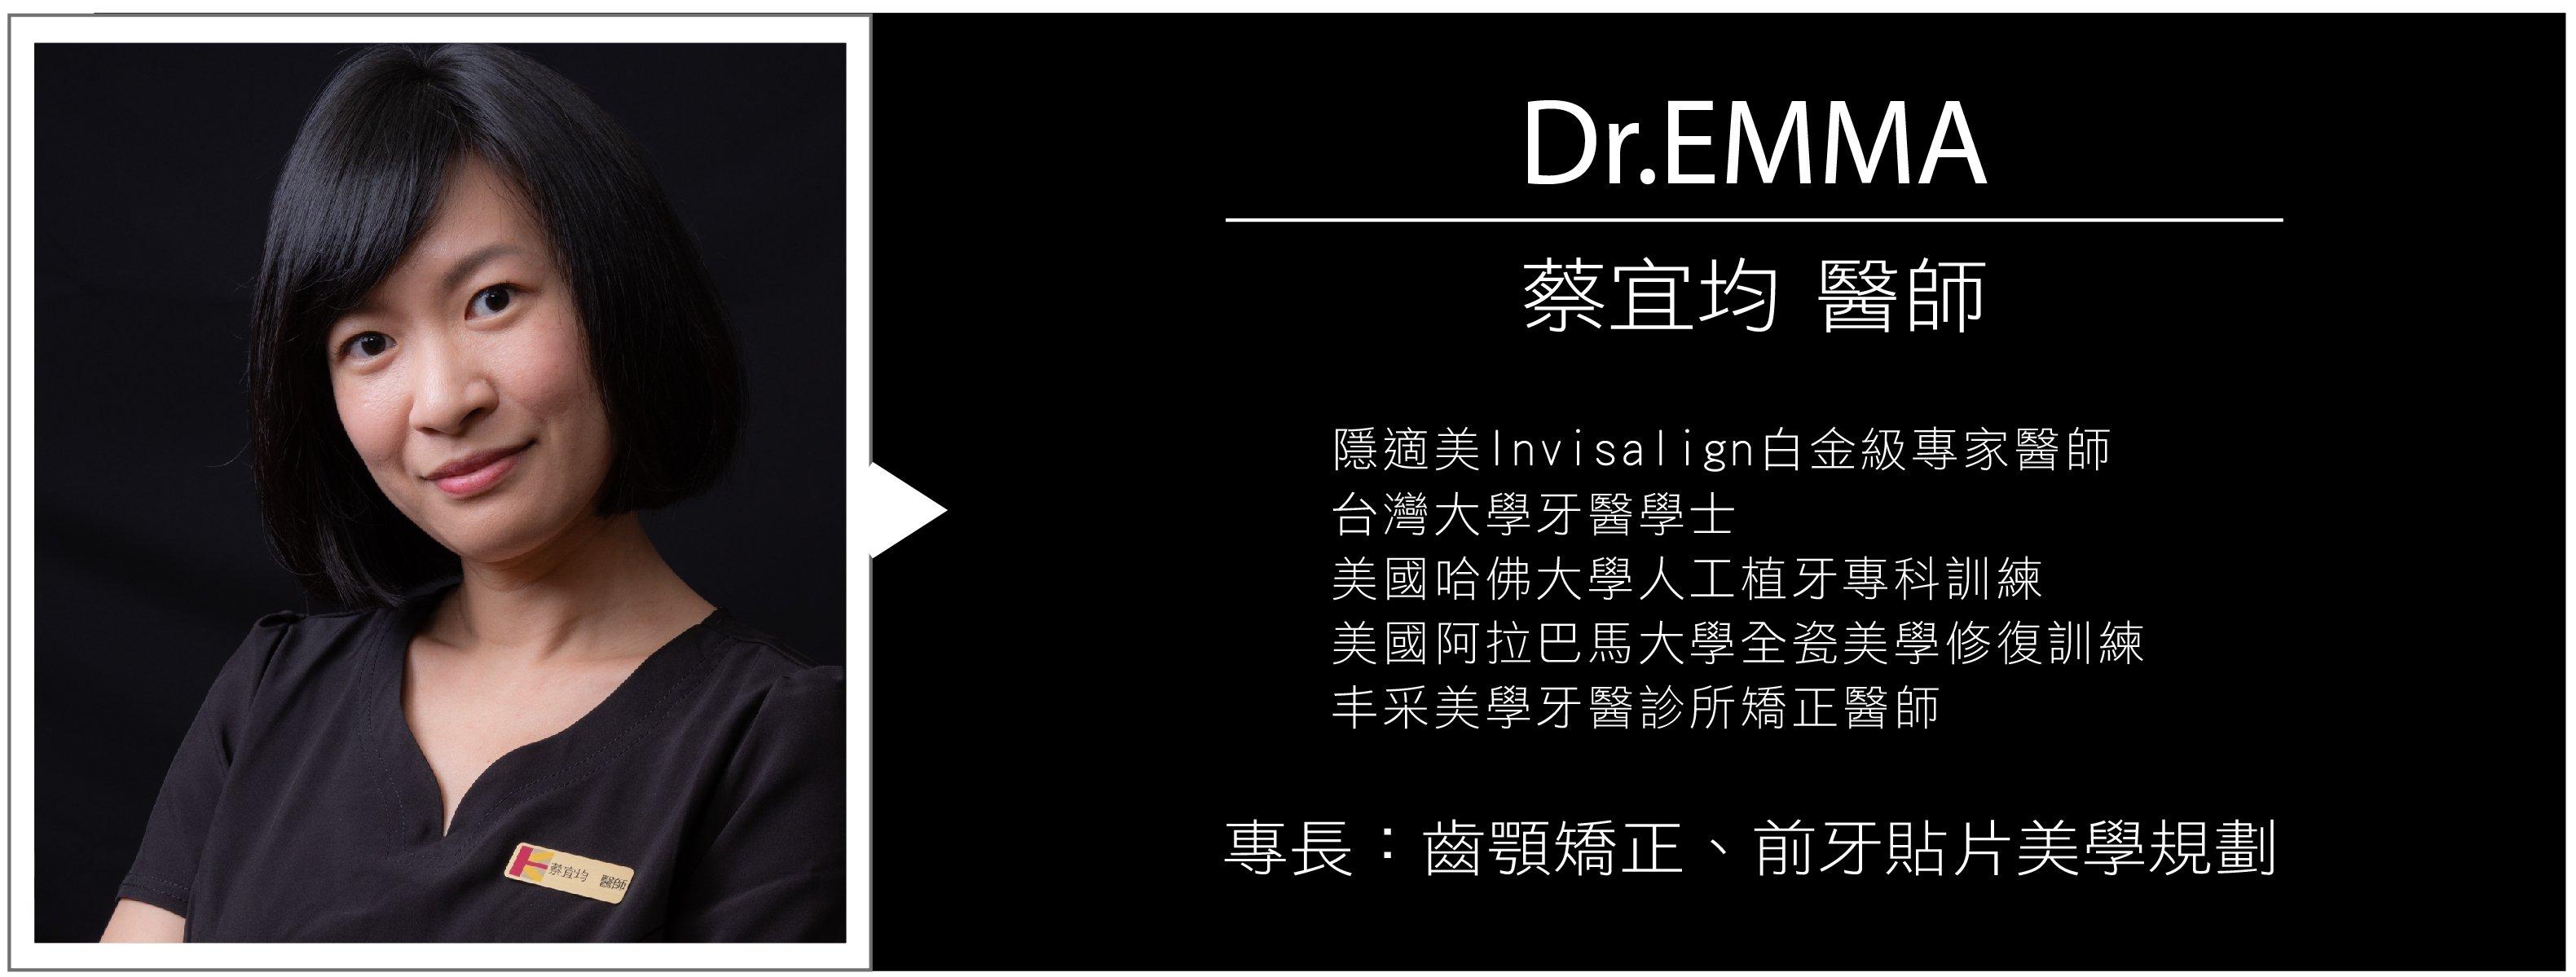 Dr.Emma蔡宜均醫師FB粉絲頁